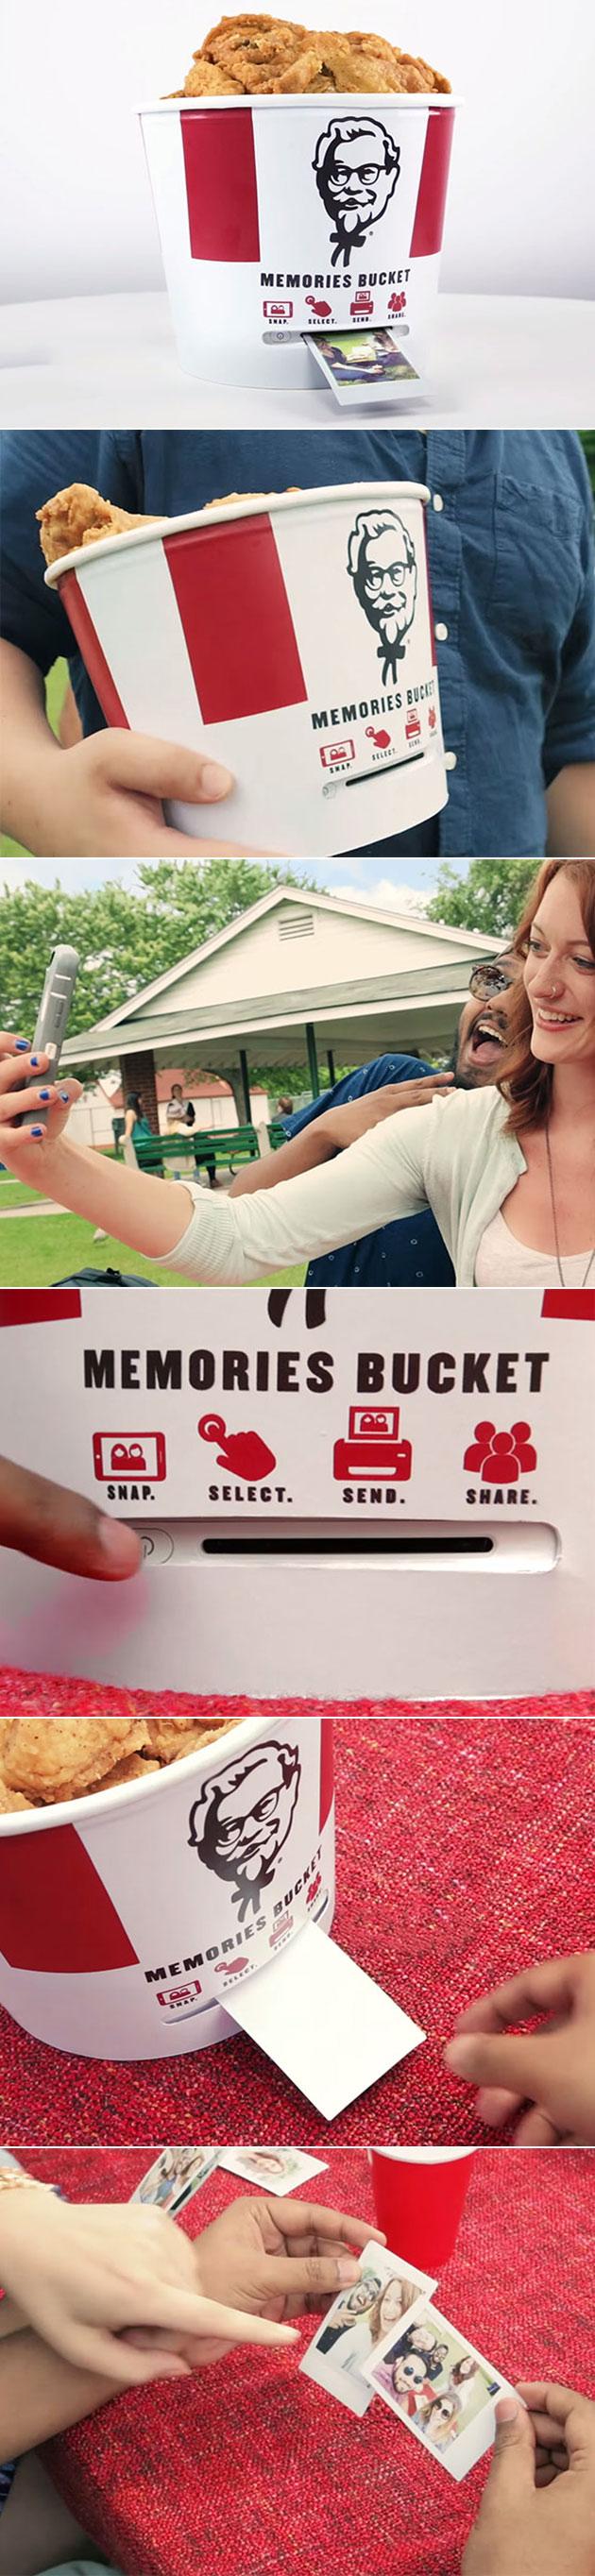 KFC Bucket Photo Printer